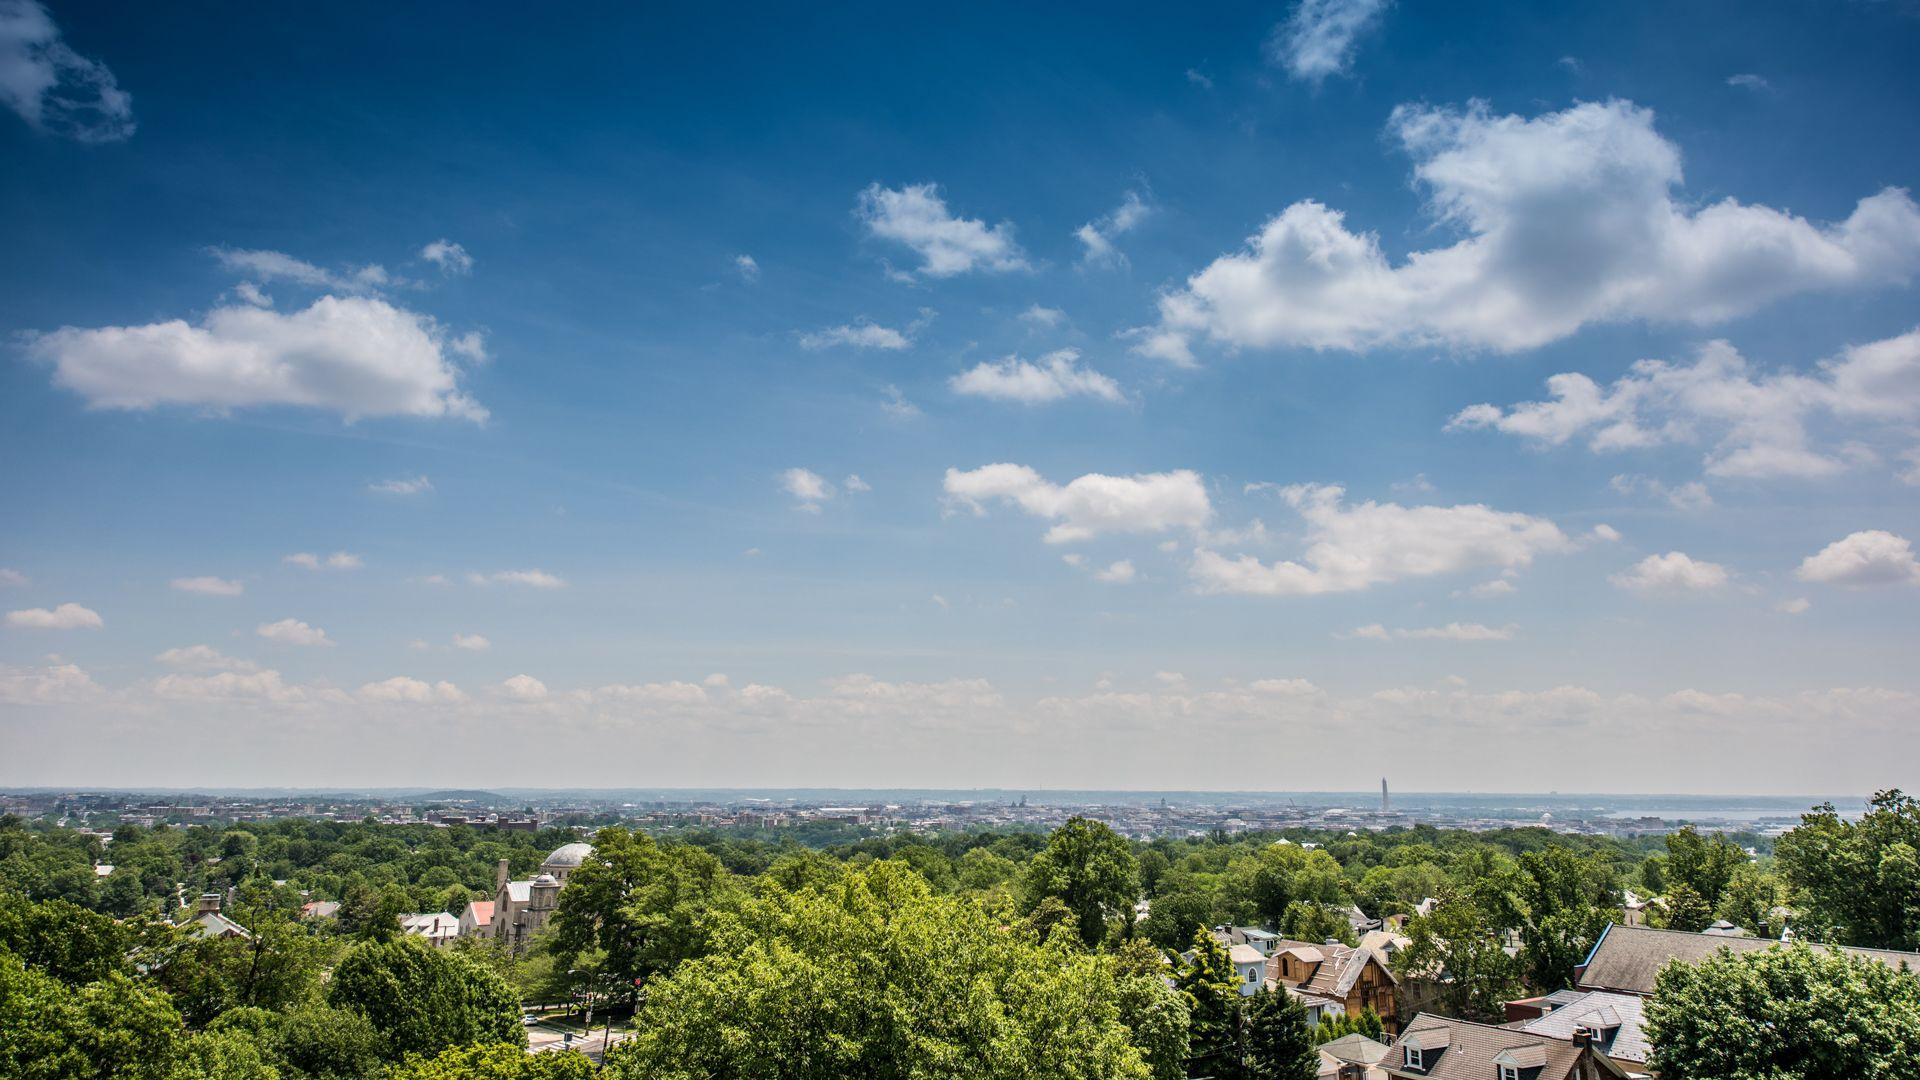 Alban Towers Apartments - Views